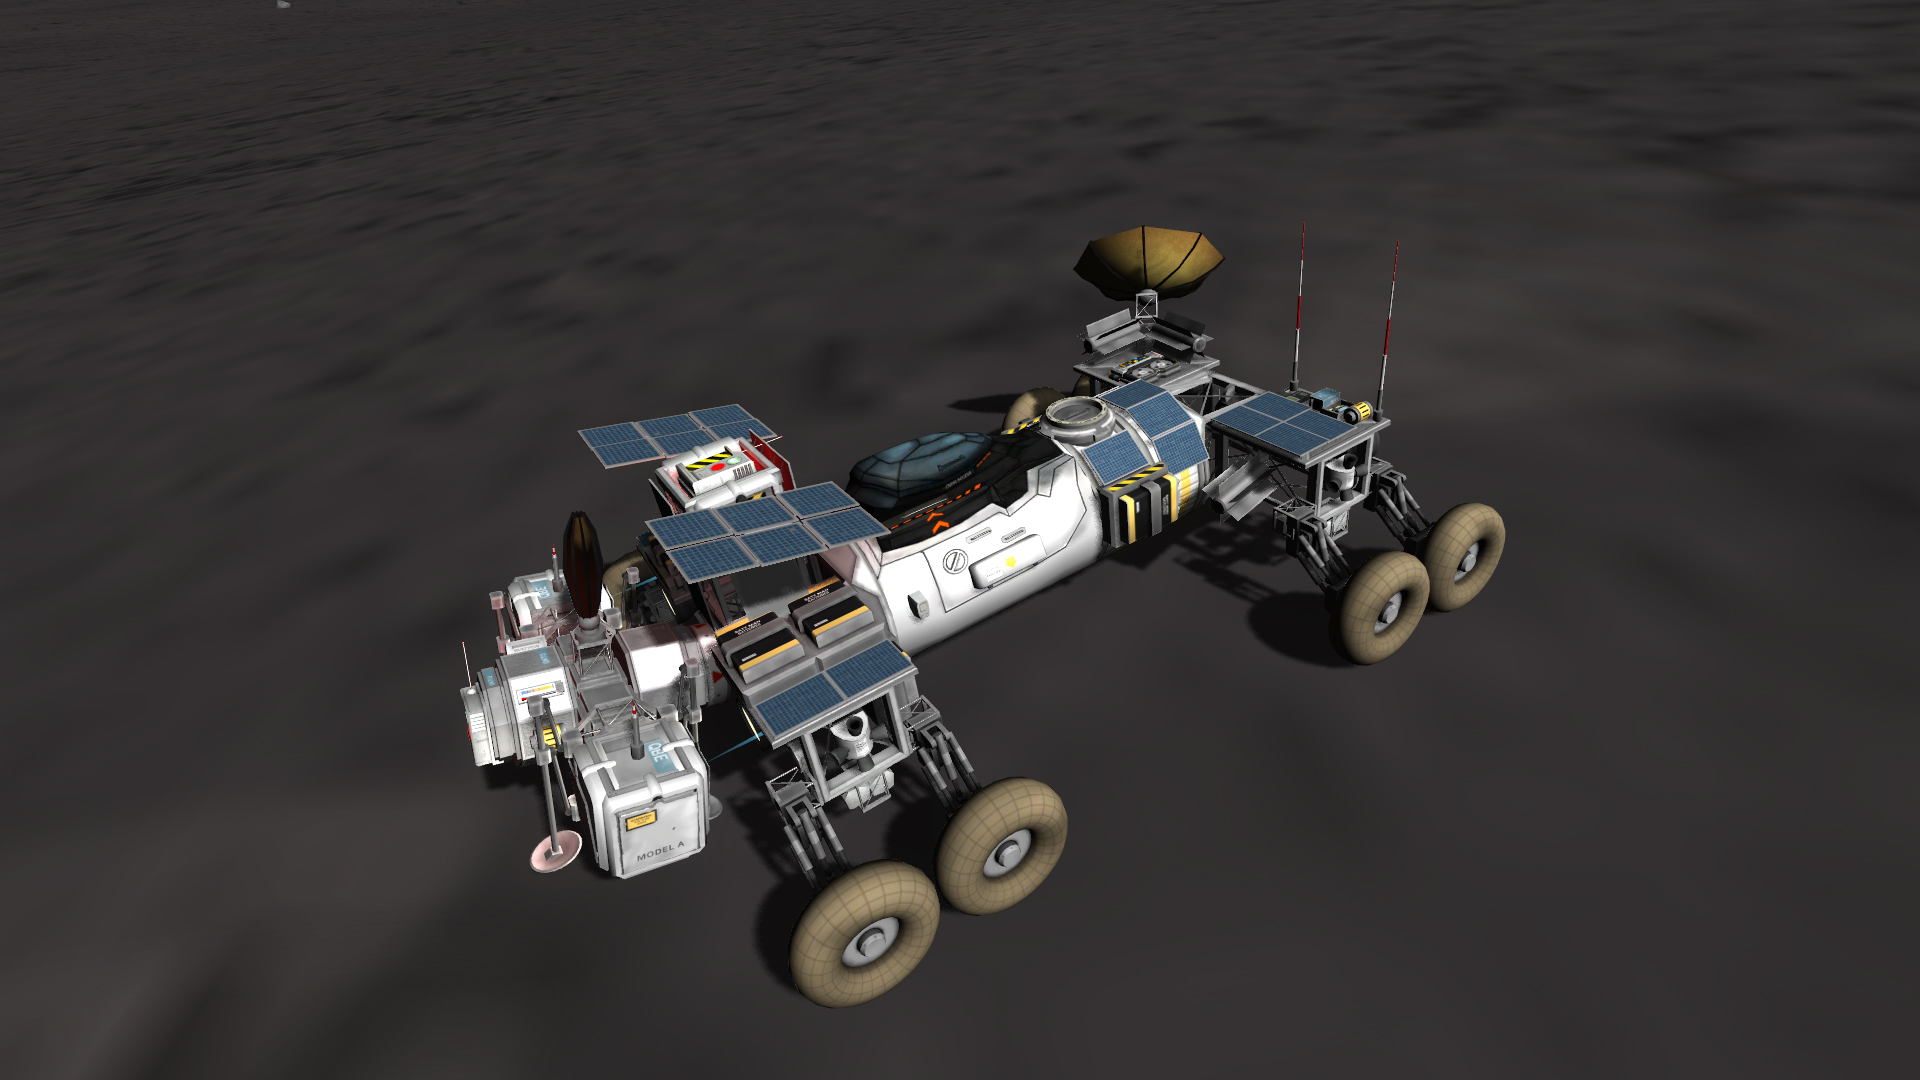 ksp mars exploration rover - photo #16